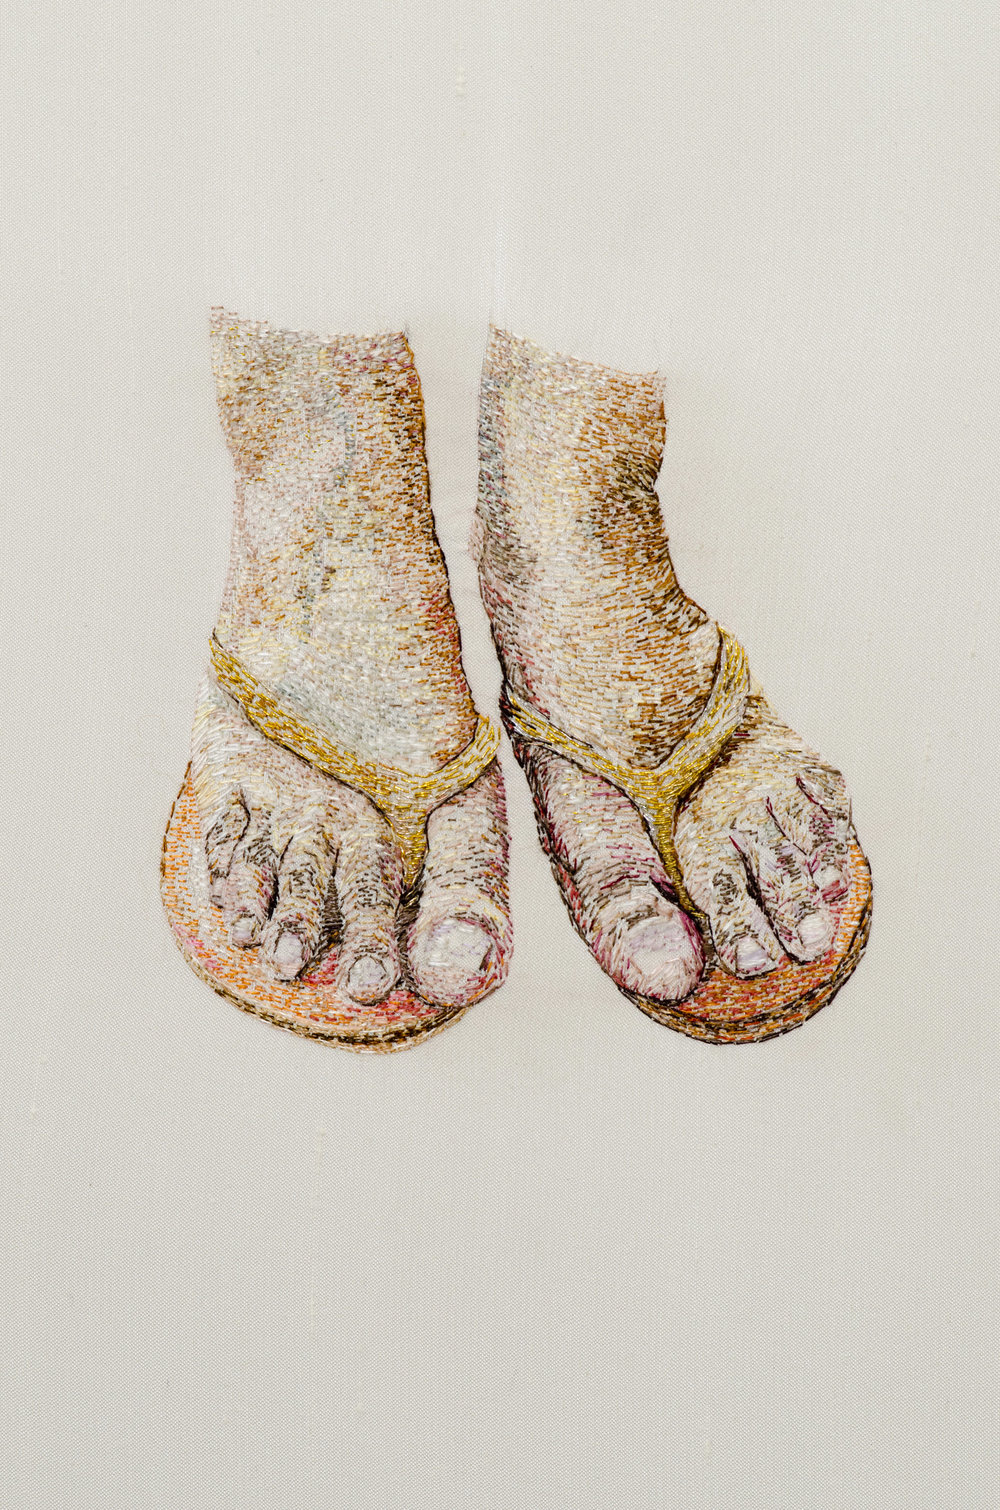 Amita_Makan,_My_Feet_I.1,_2011.jpg